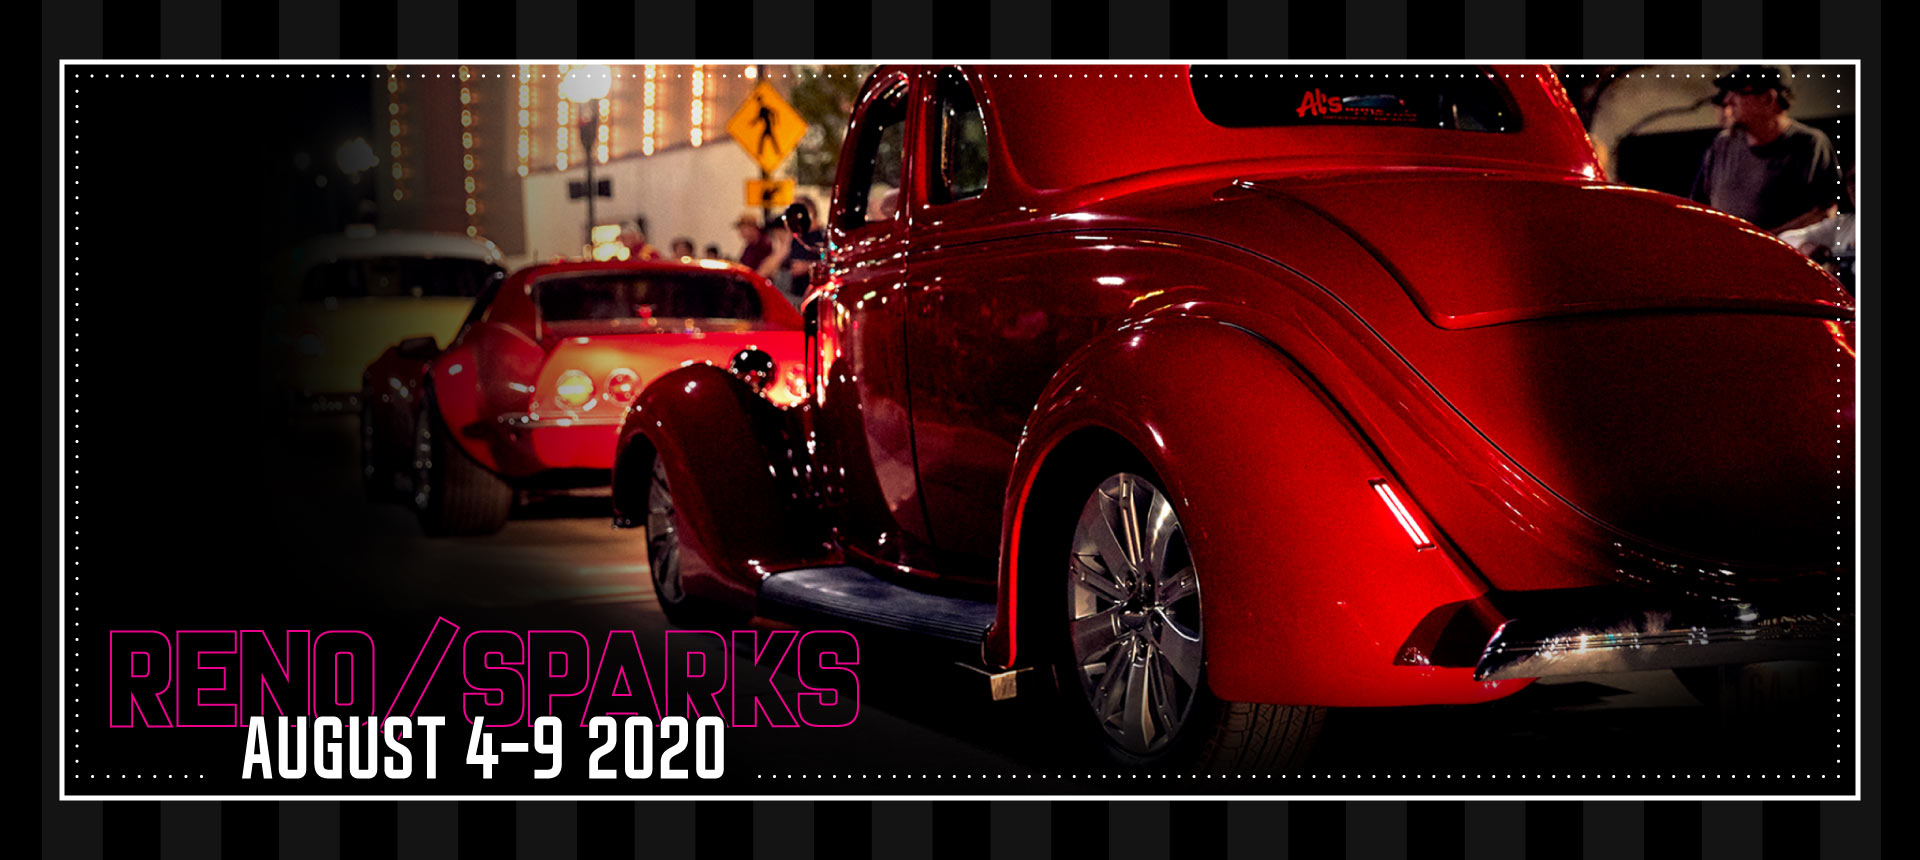 Hot August Nights 2020